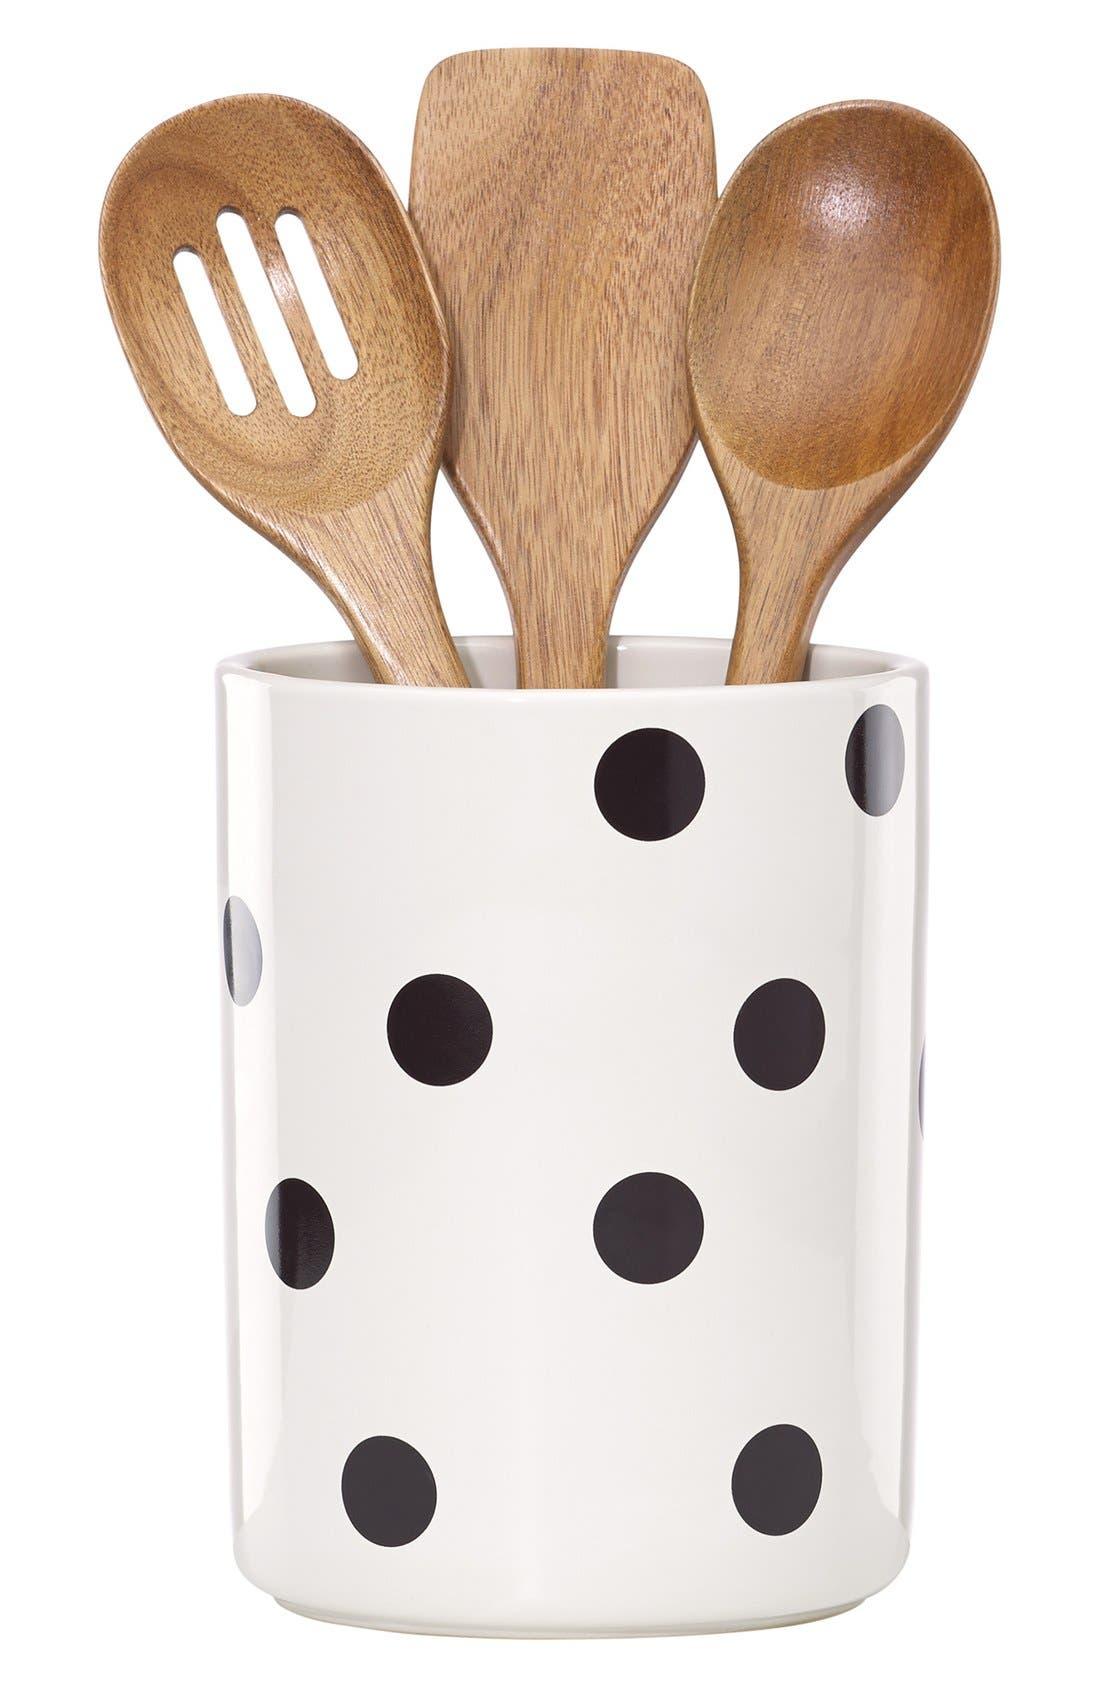 'all in good taste' 'deco' utensil crock & wooden spoons,                         Main,                         color, 100